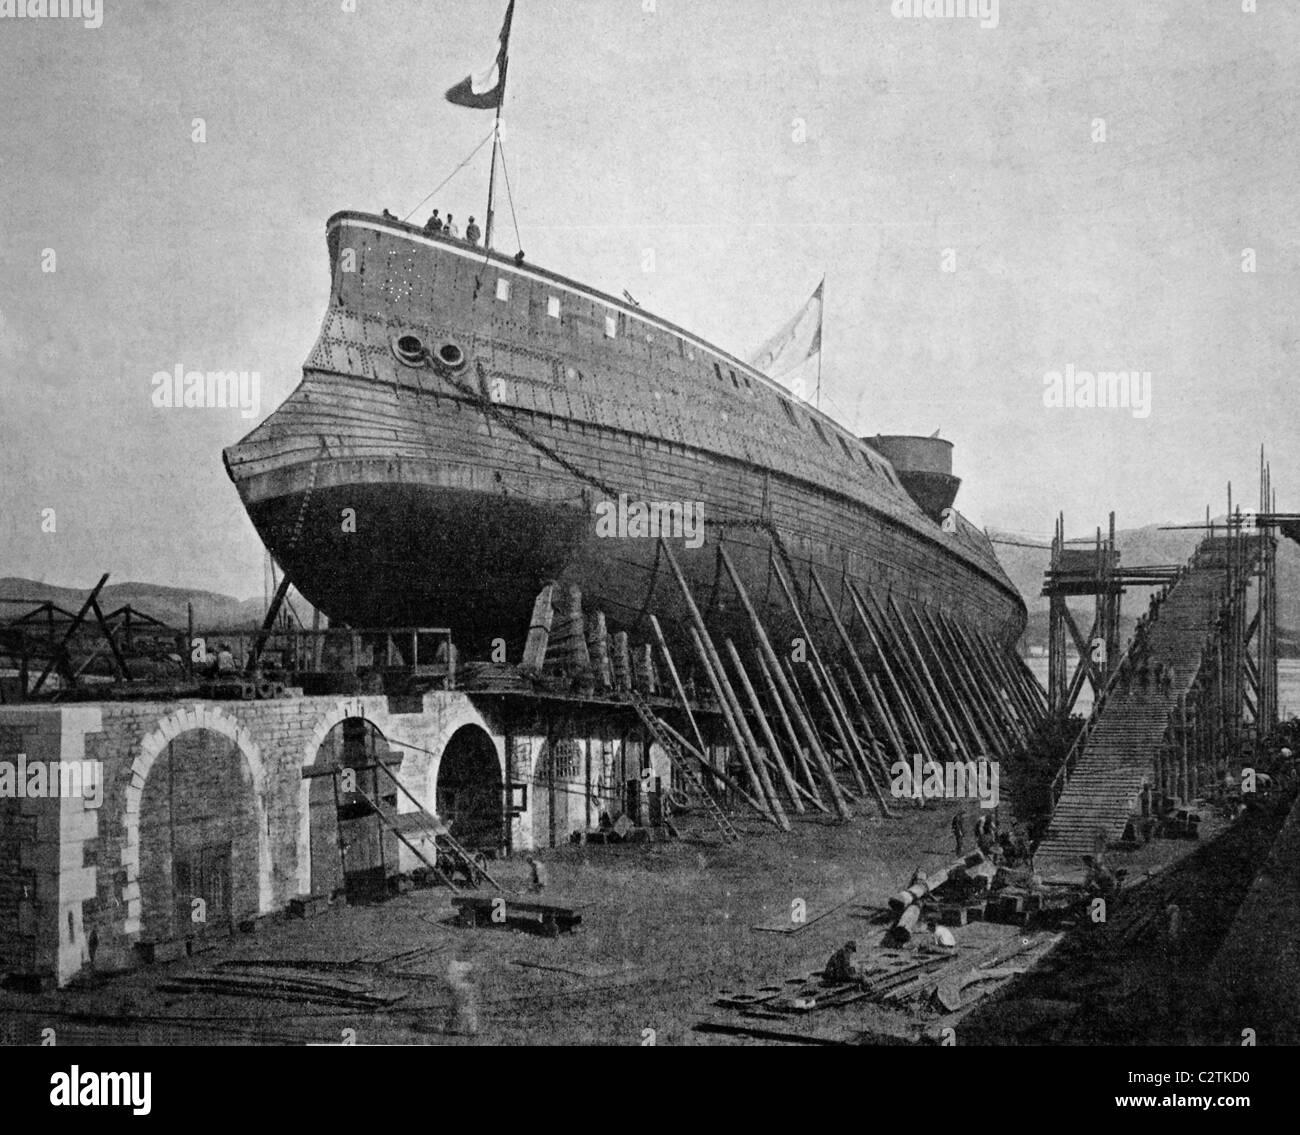 Autotype of the launch of the Le Chantier du Marceau warship in Seyne-sur-Mer, Cote d'Azur, France, historical - Stock Image